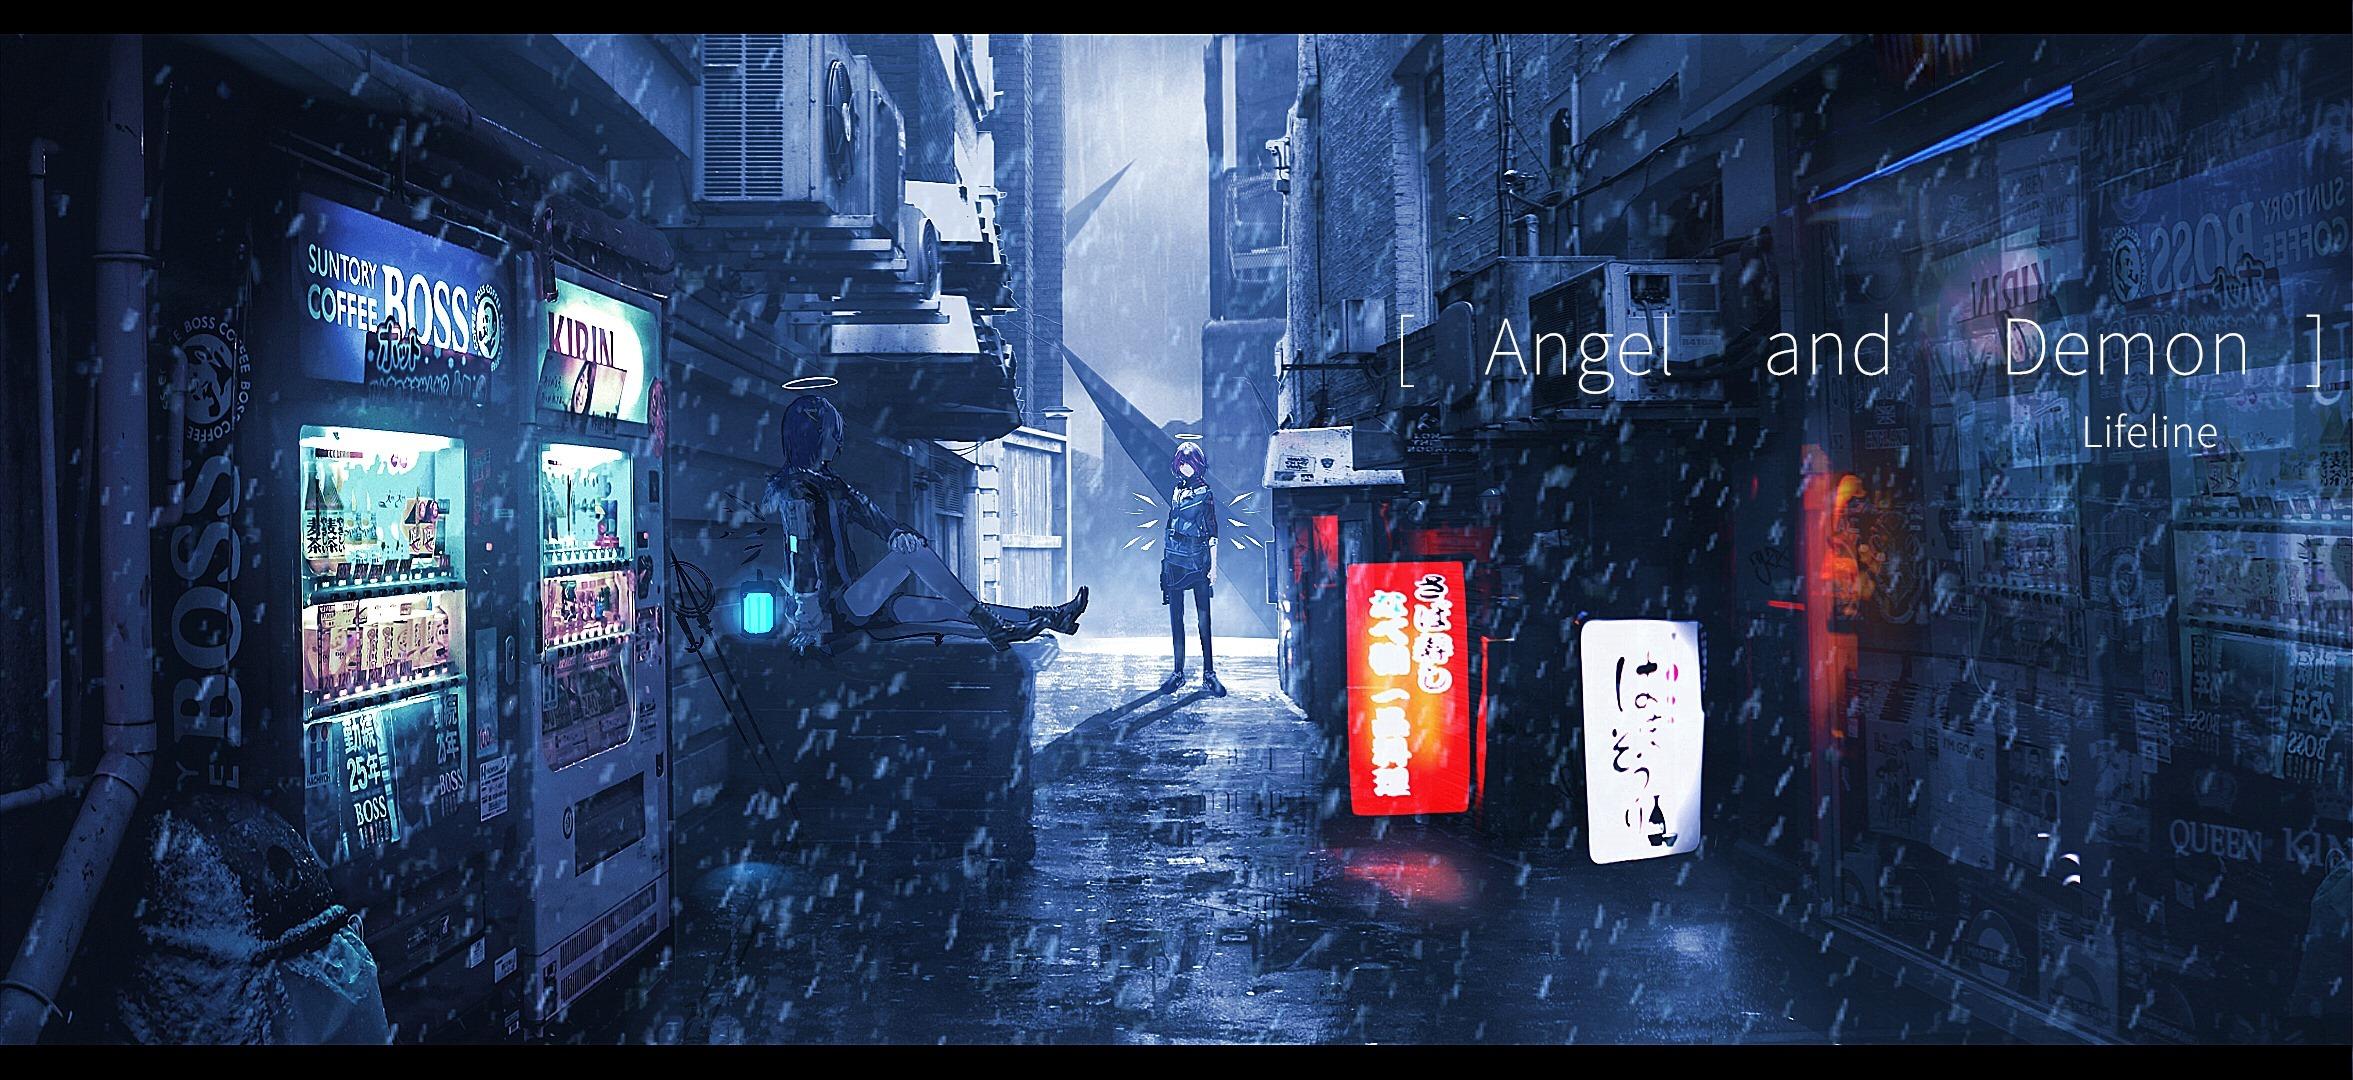 【P站画师】光与影的交织!中国画师Lifeline的插画作品